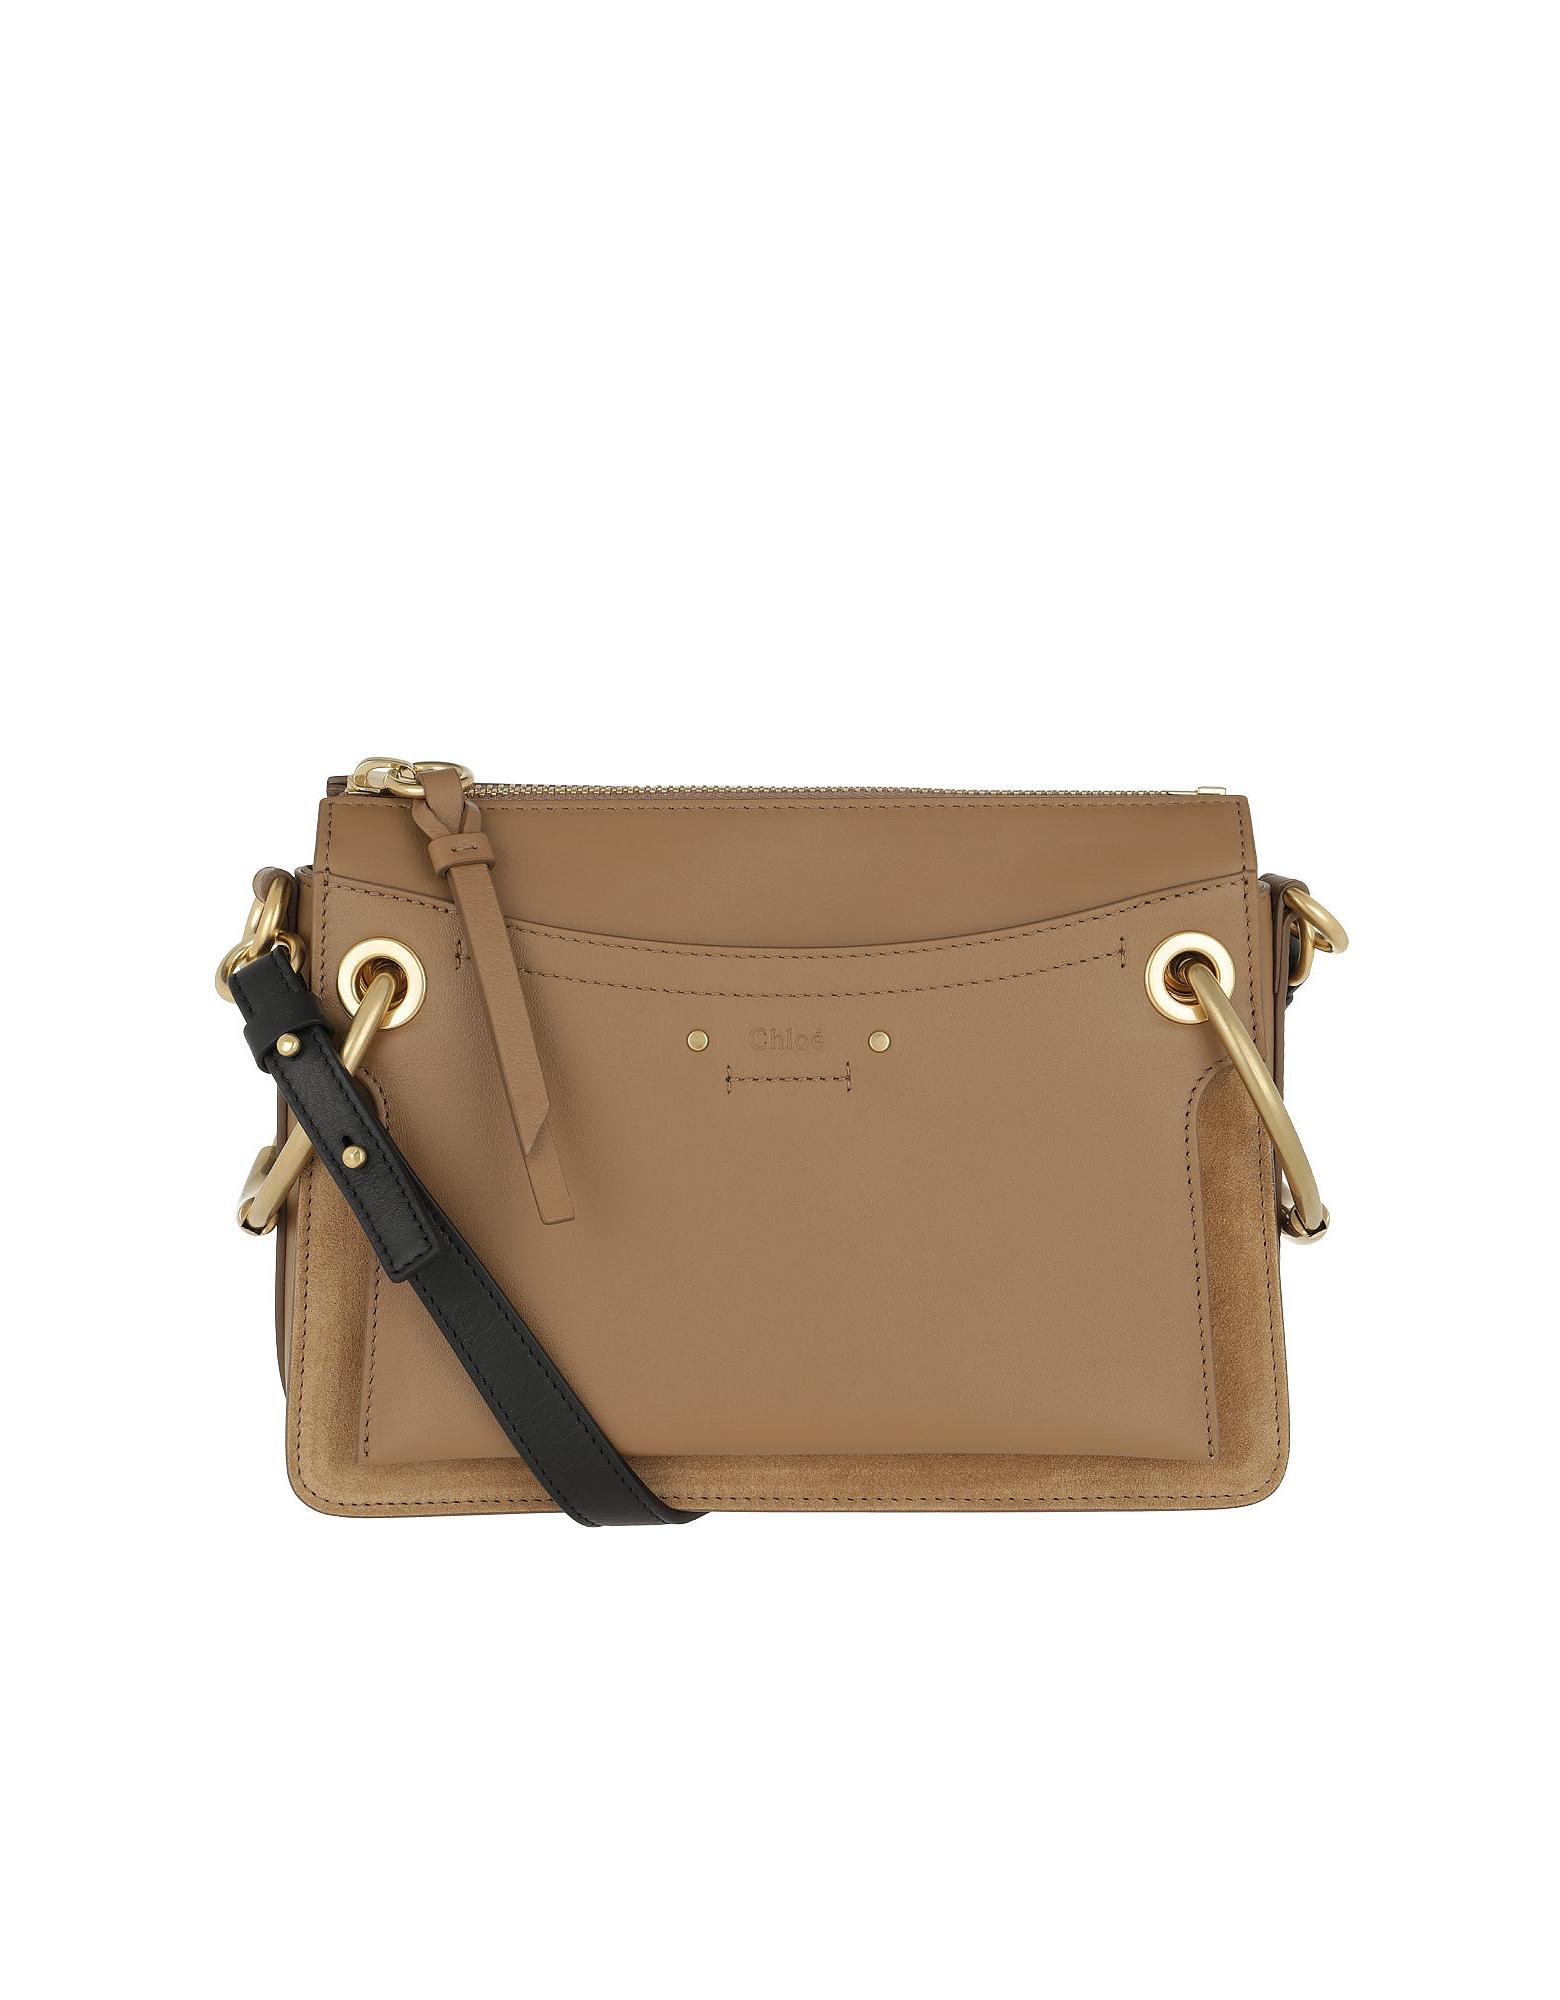 Chloe Handbags, Roy Bag Small Nut